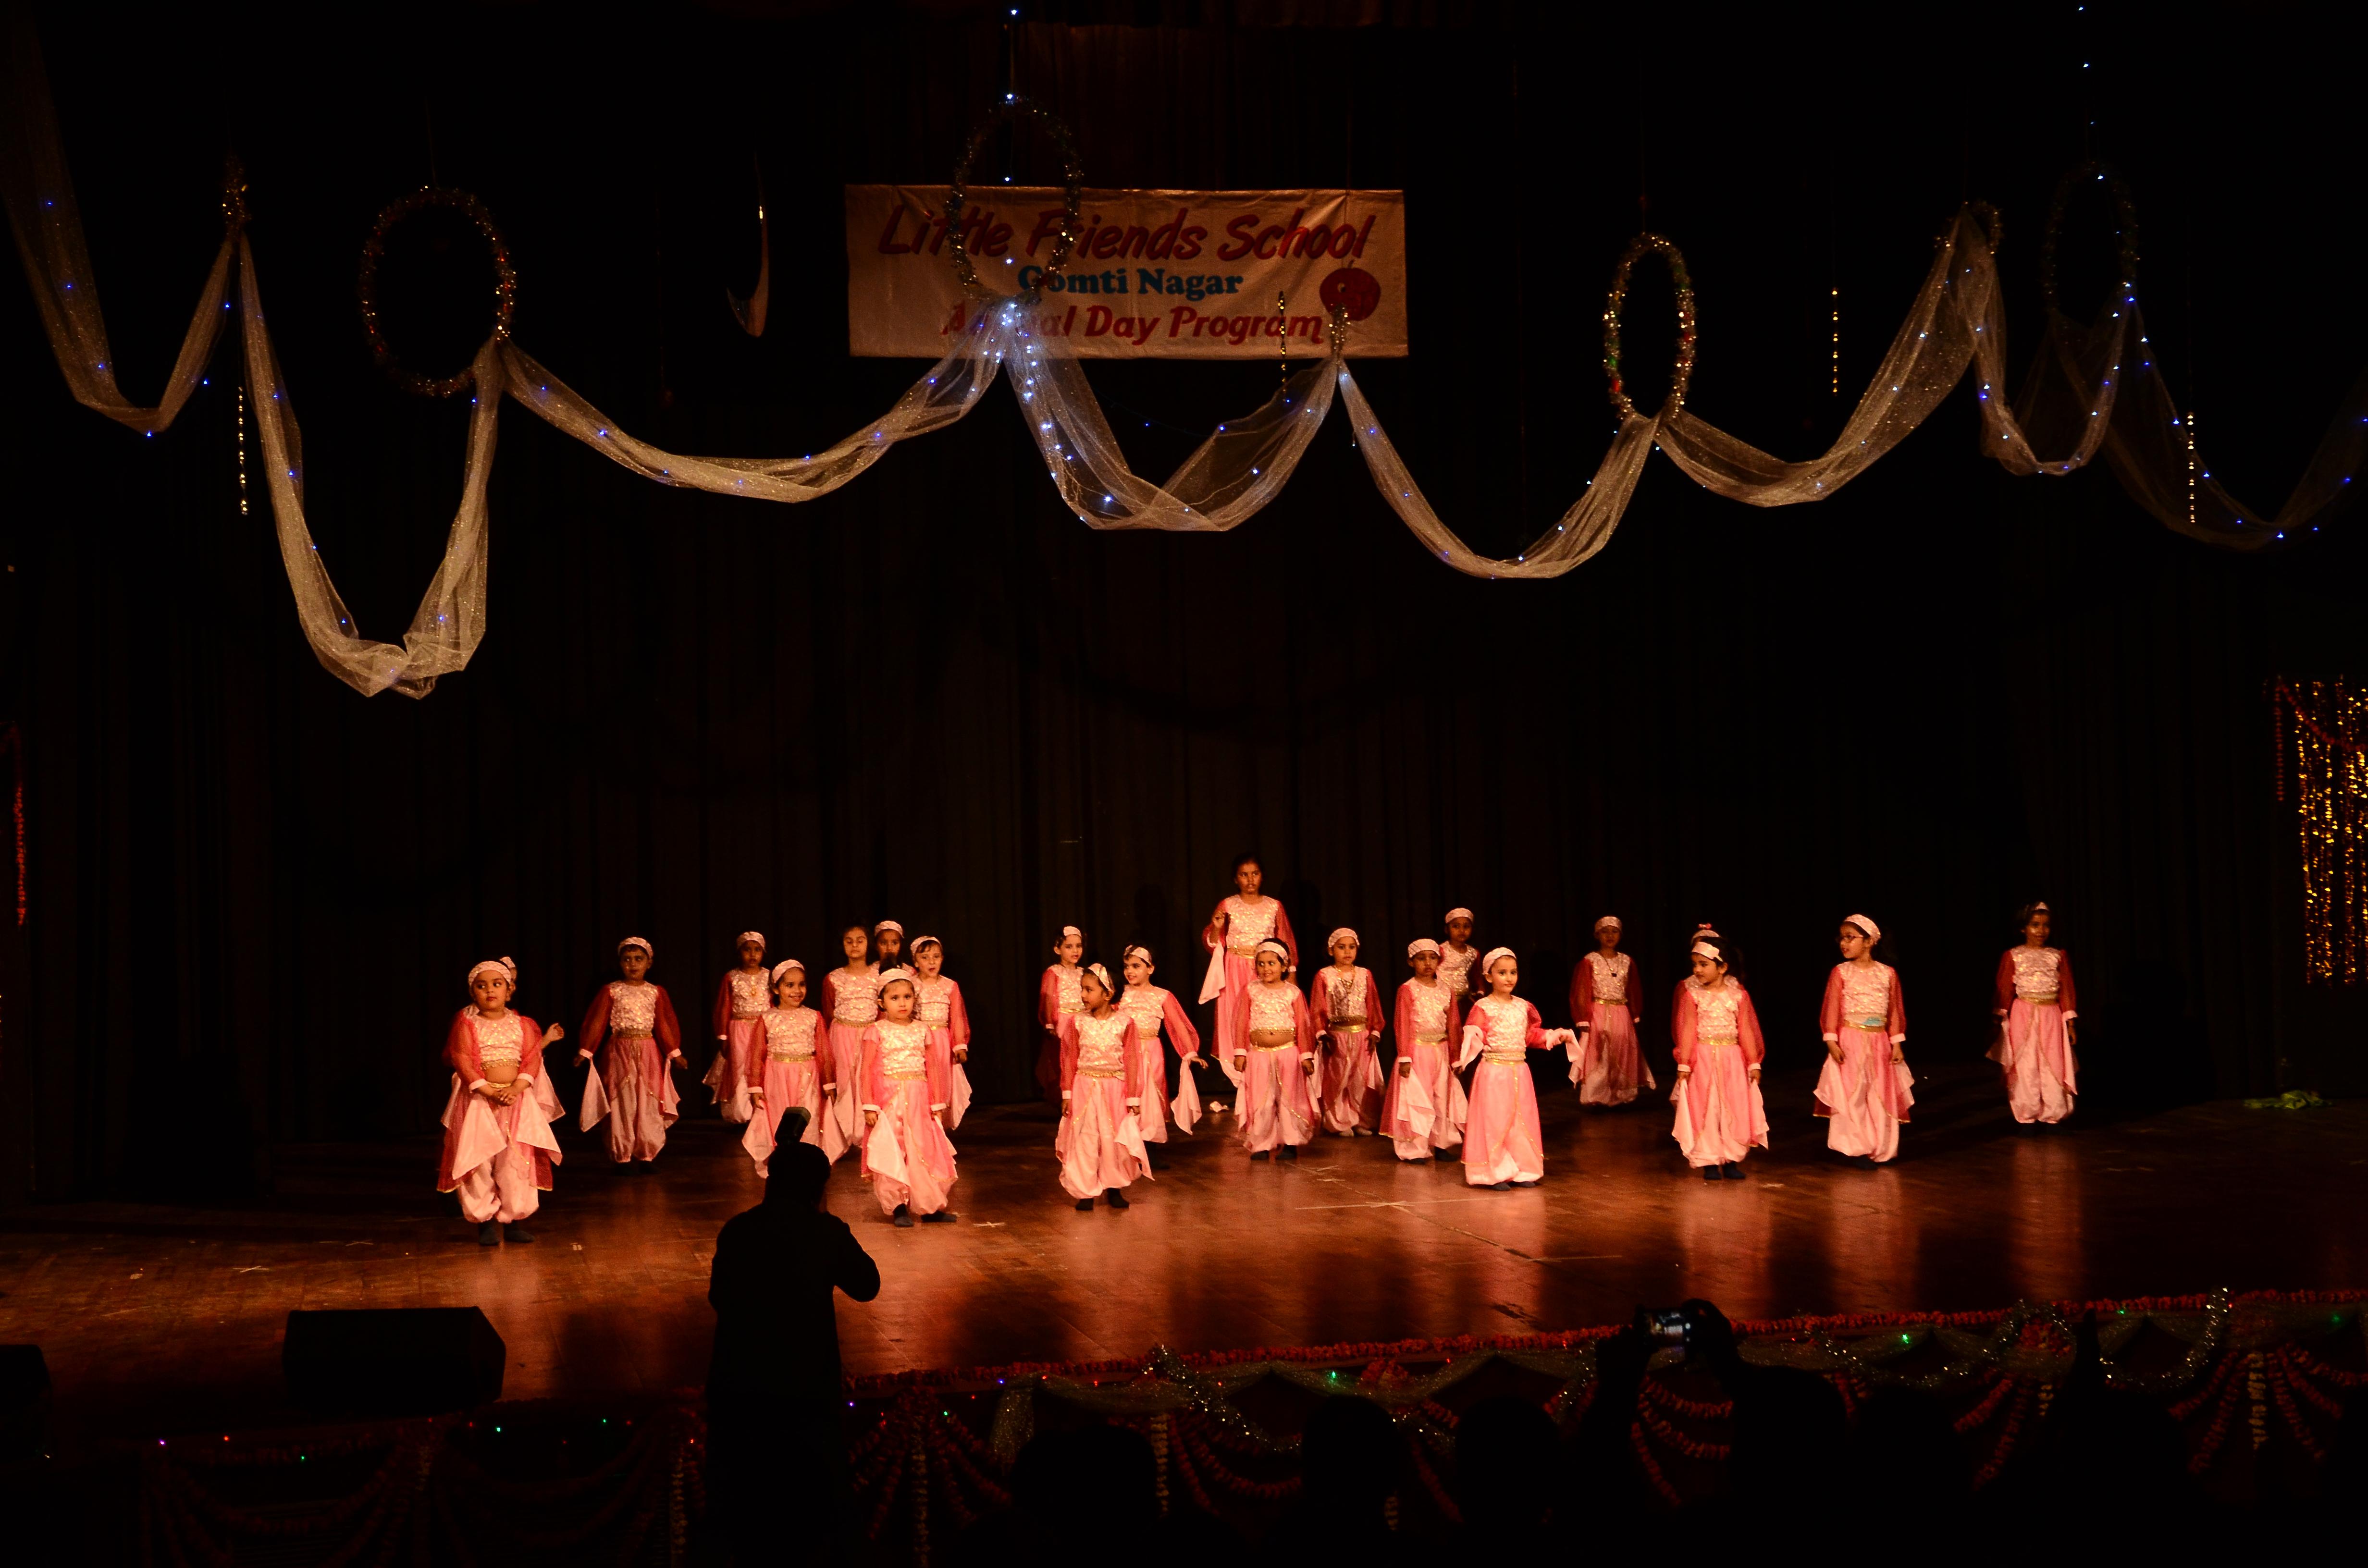 The Arabian Nights Annual Day Program 2020 6, Feb 2020